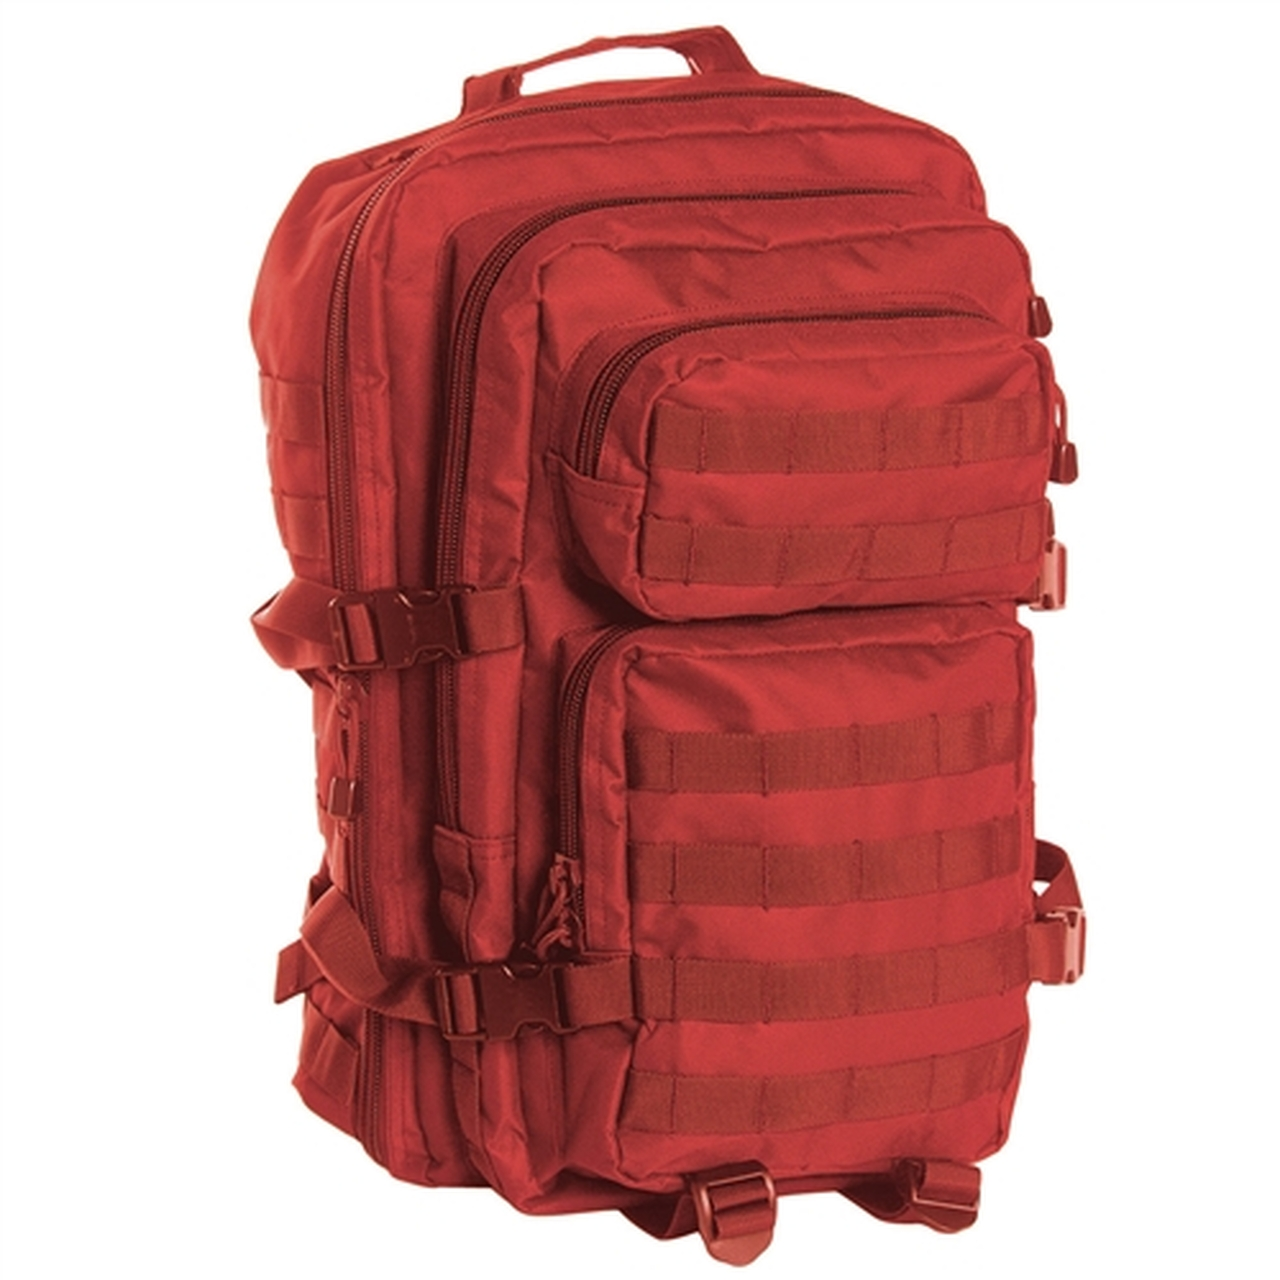 Red Assault Pack  -  Large Hessen Antique